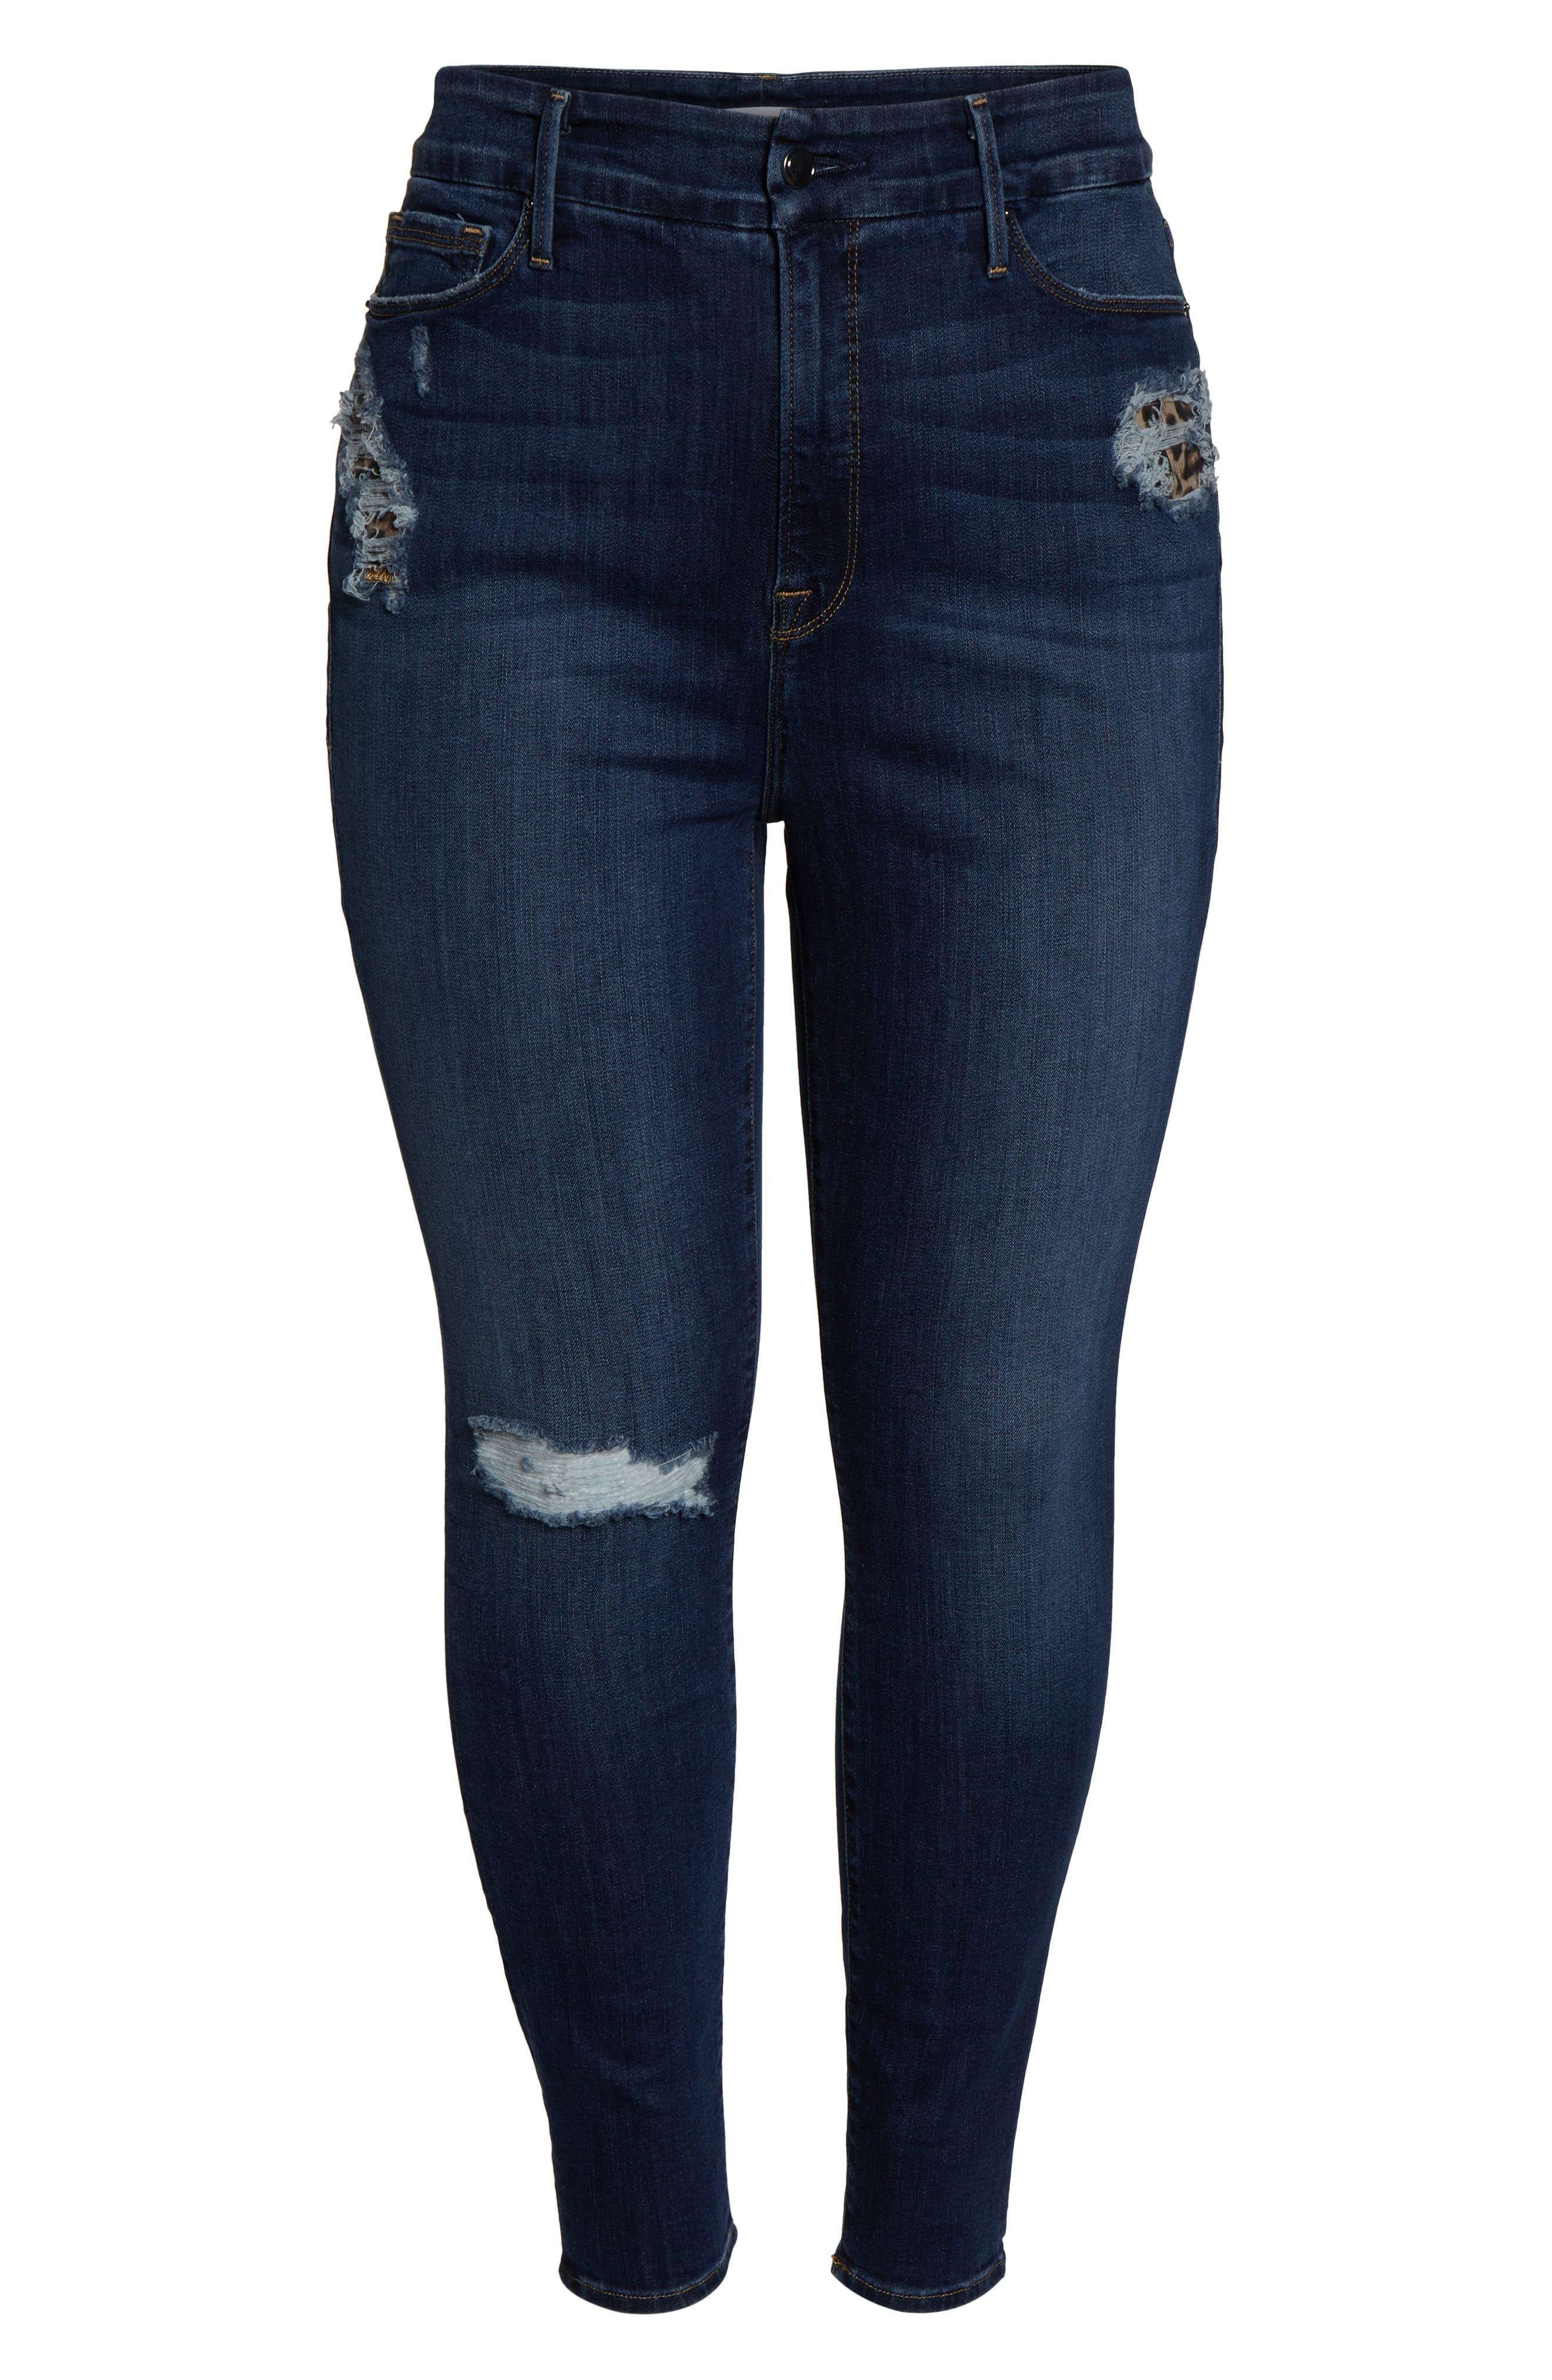 GOOD AMERICAN, Good Legs Cheetah Pockets High Waist Jeans, Alternate thumbnail 6, color, BLUE203